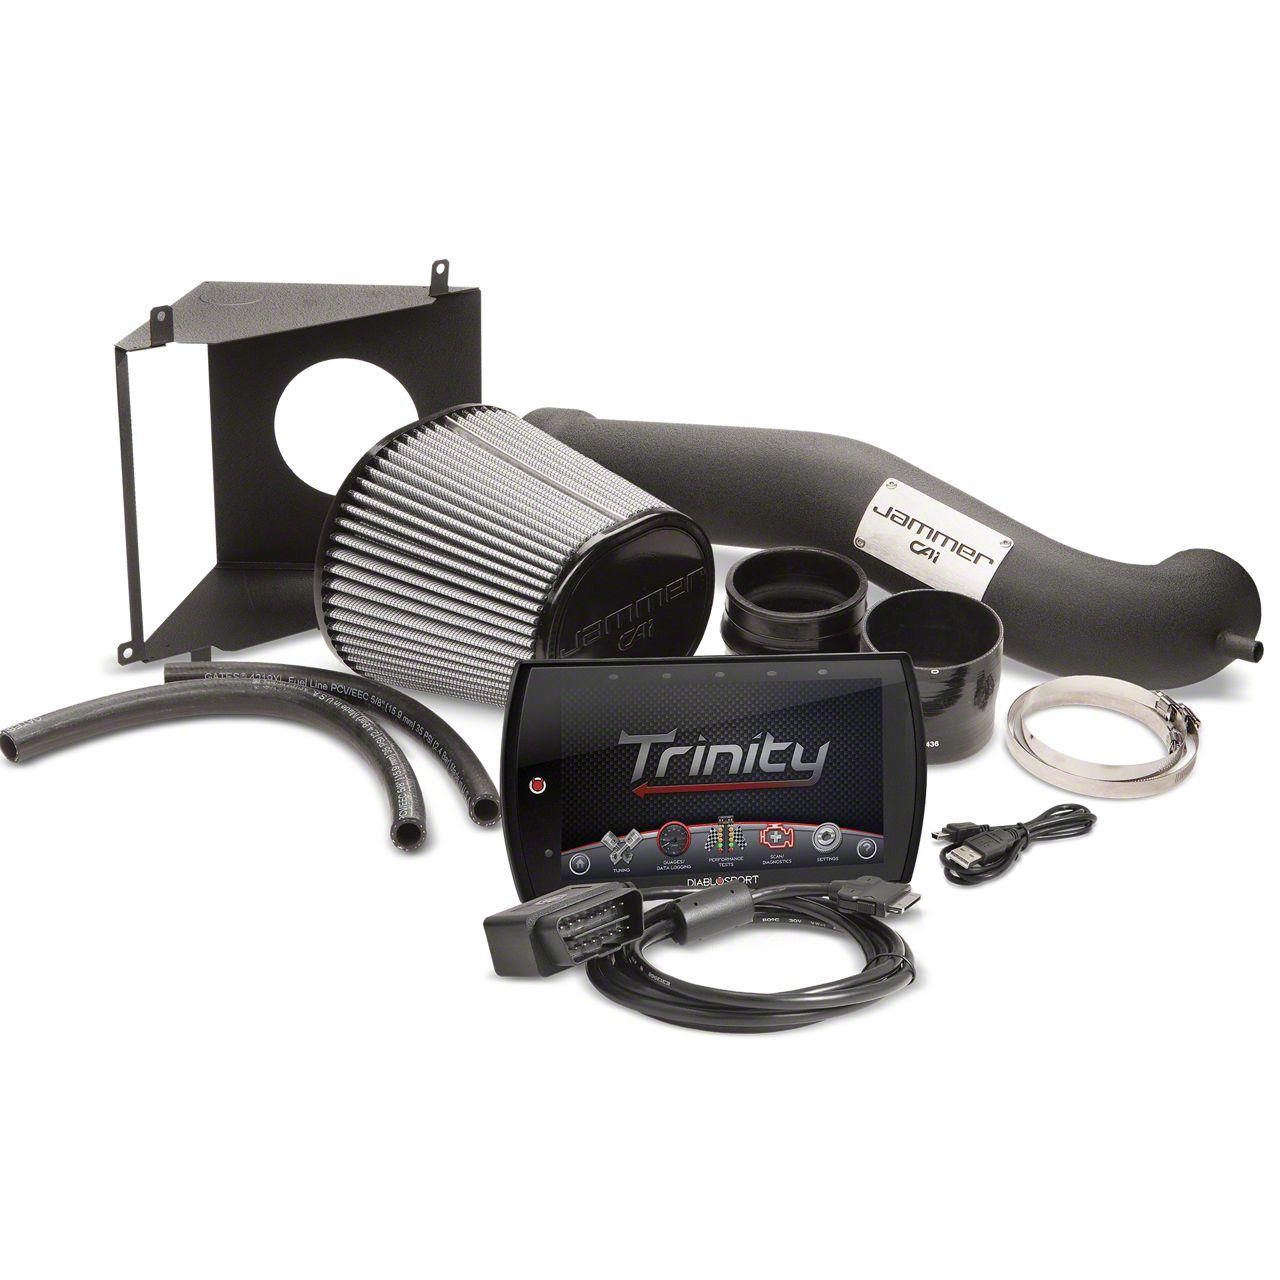 Diablosport Reaper Jammer Cold Air Intake & Trinity 2 Tuner Combo Kit - Stage 1 (09-13 5.3L Silverado 1500)